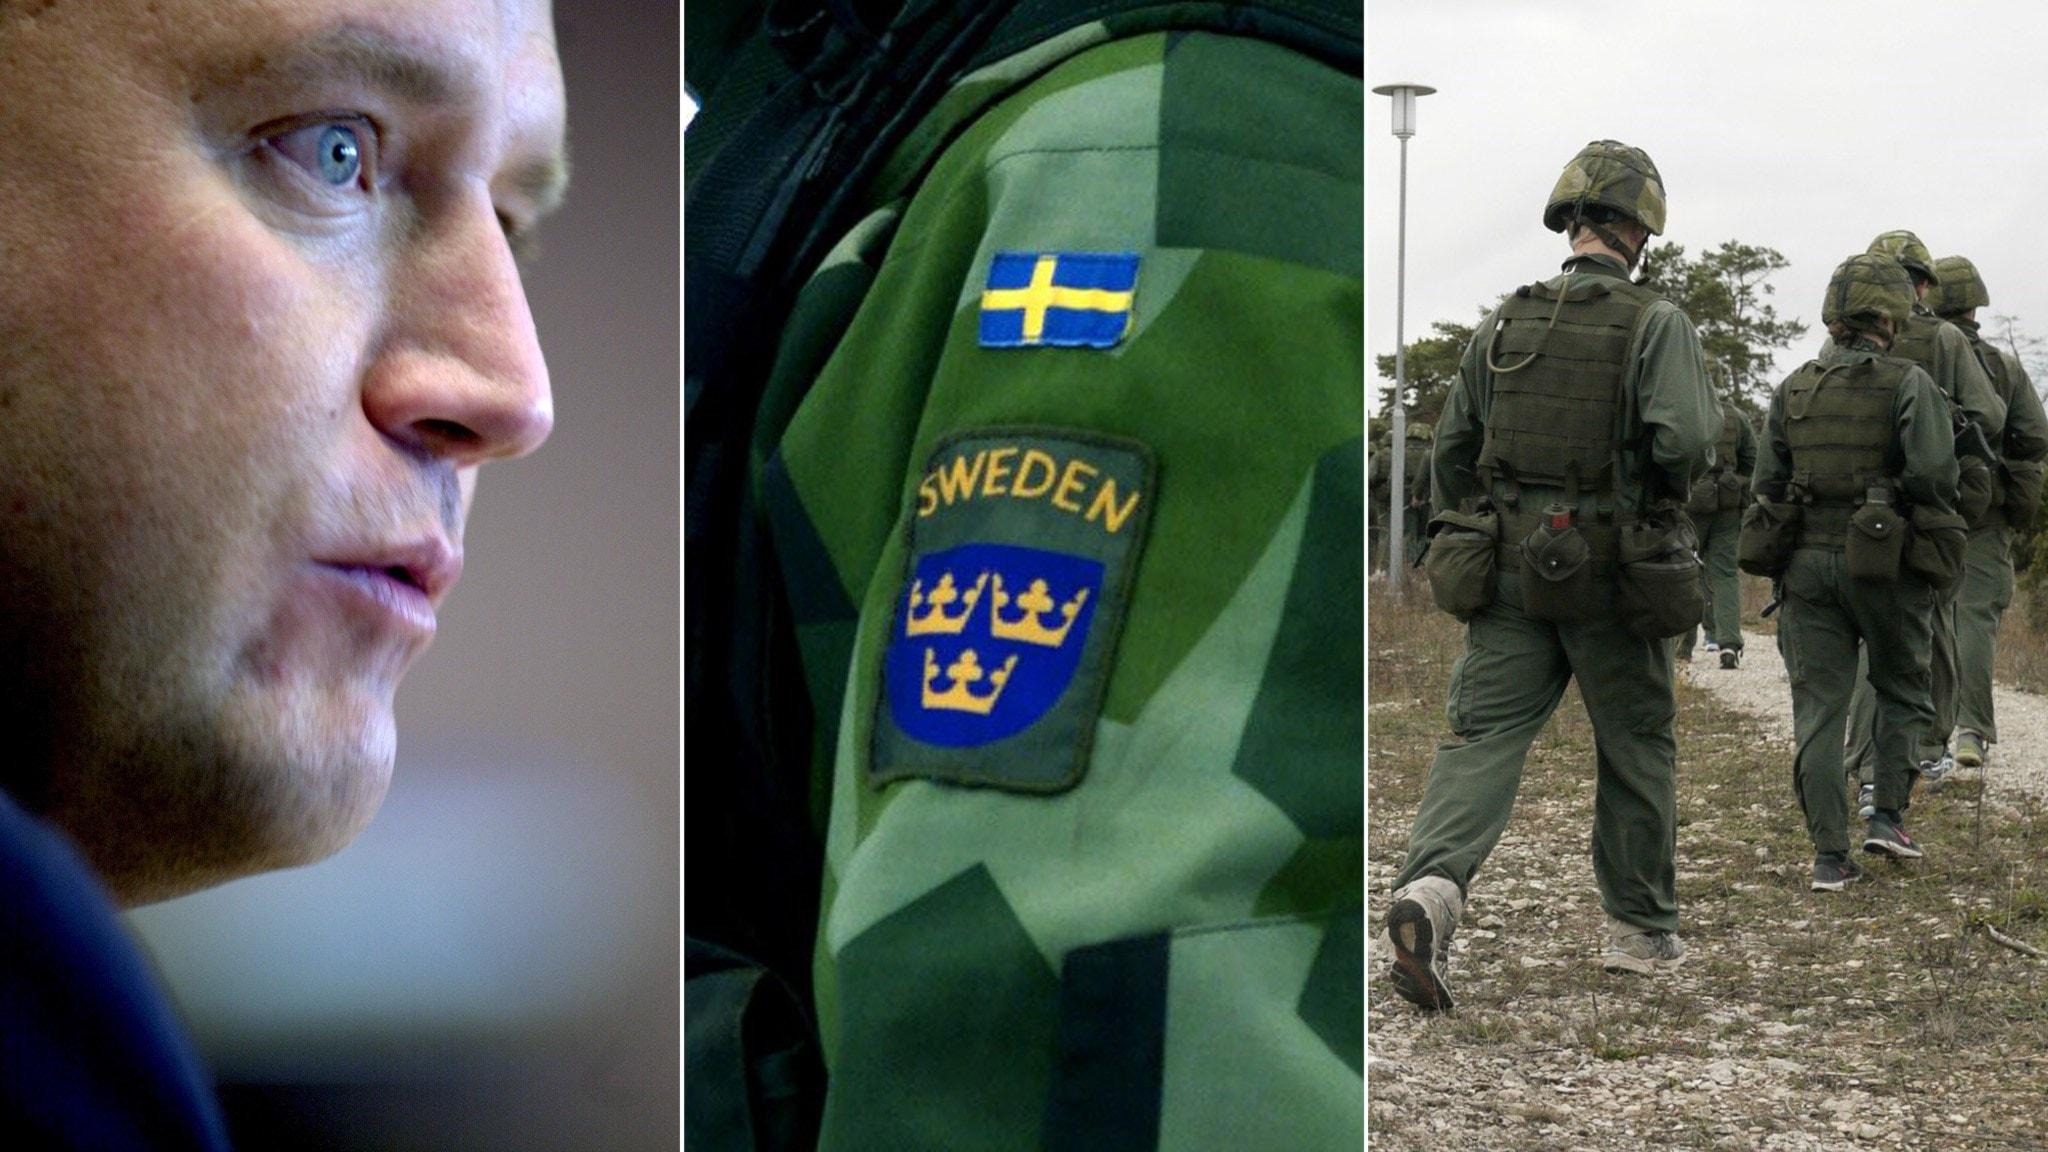 23904541119c #nyaförsvaret - P1-morgon | Sveriges Radio